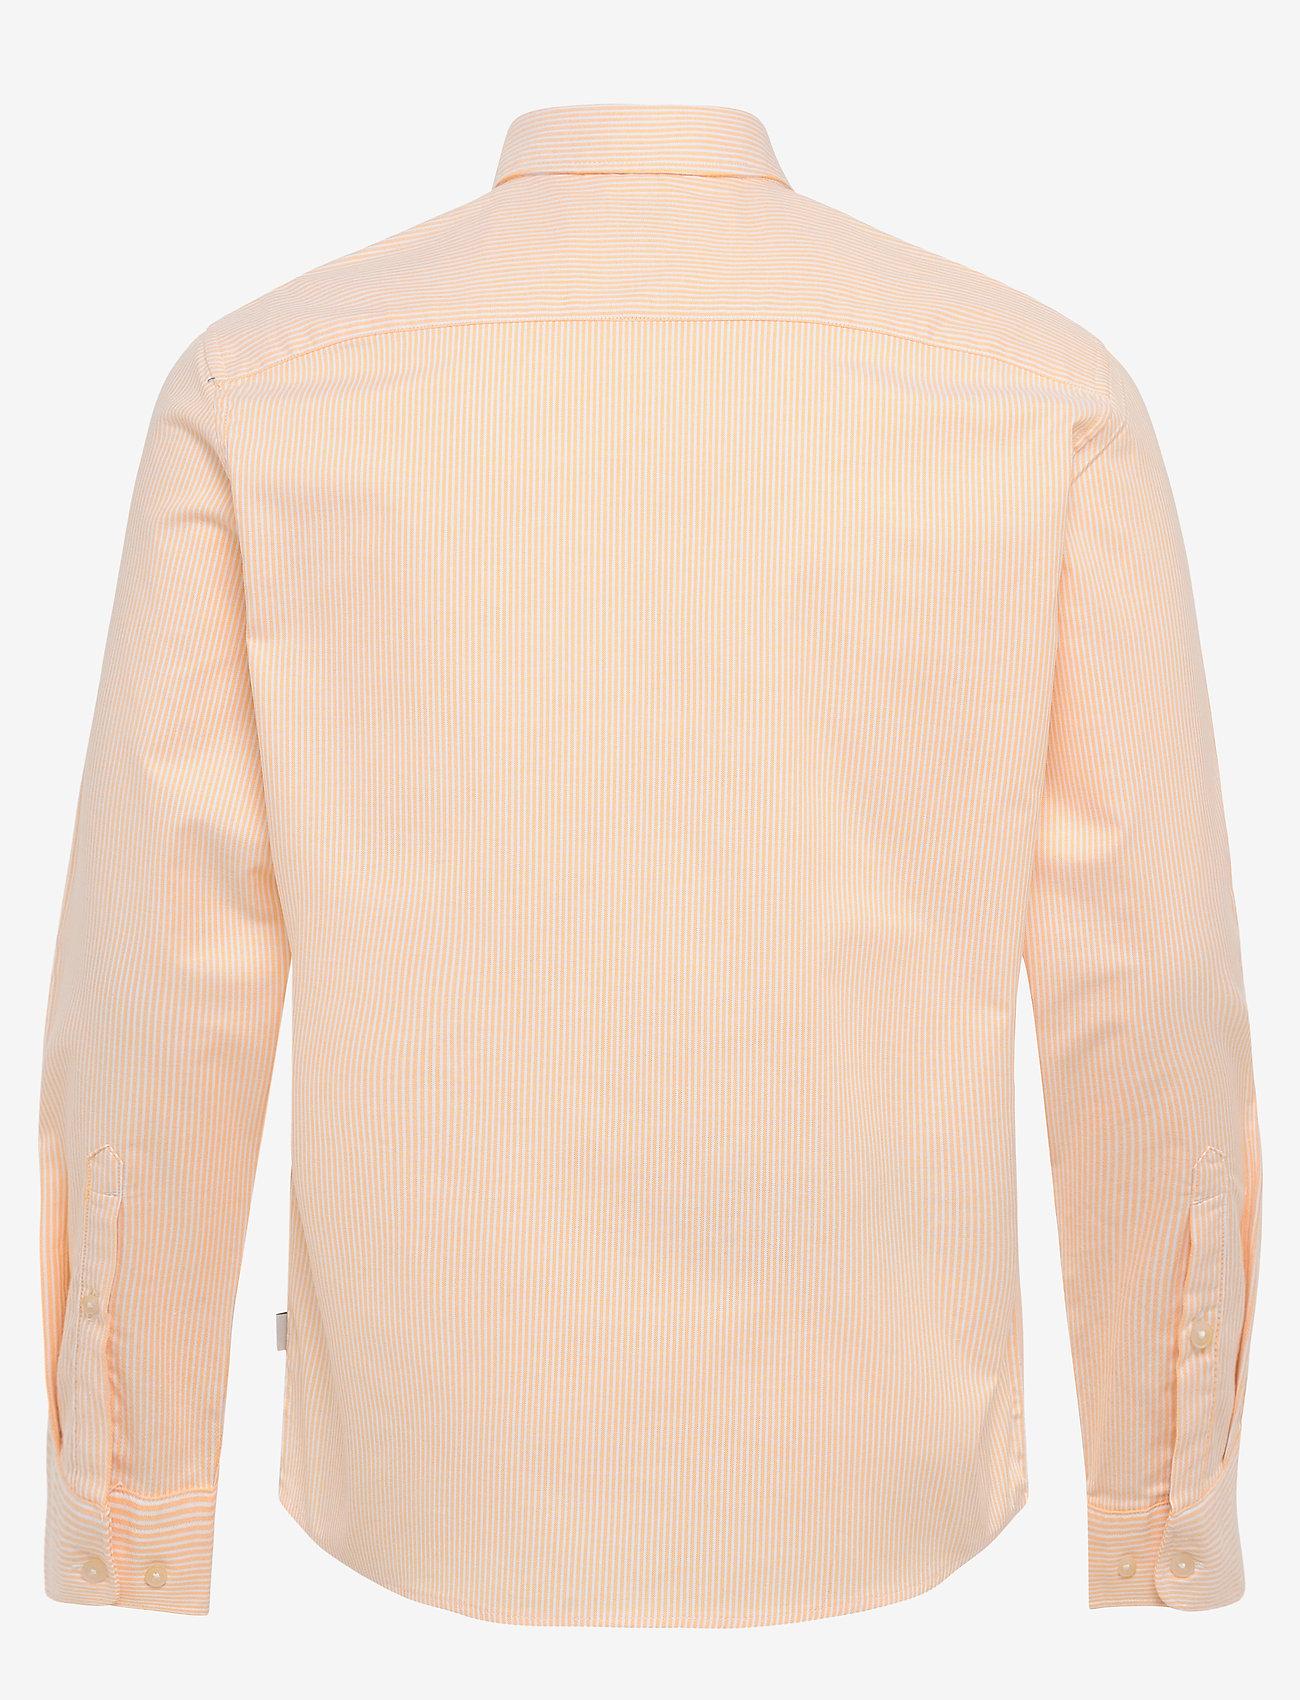 Esprit Casual - Shirts woven - oxford shirts - honey yellow 3 - 1